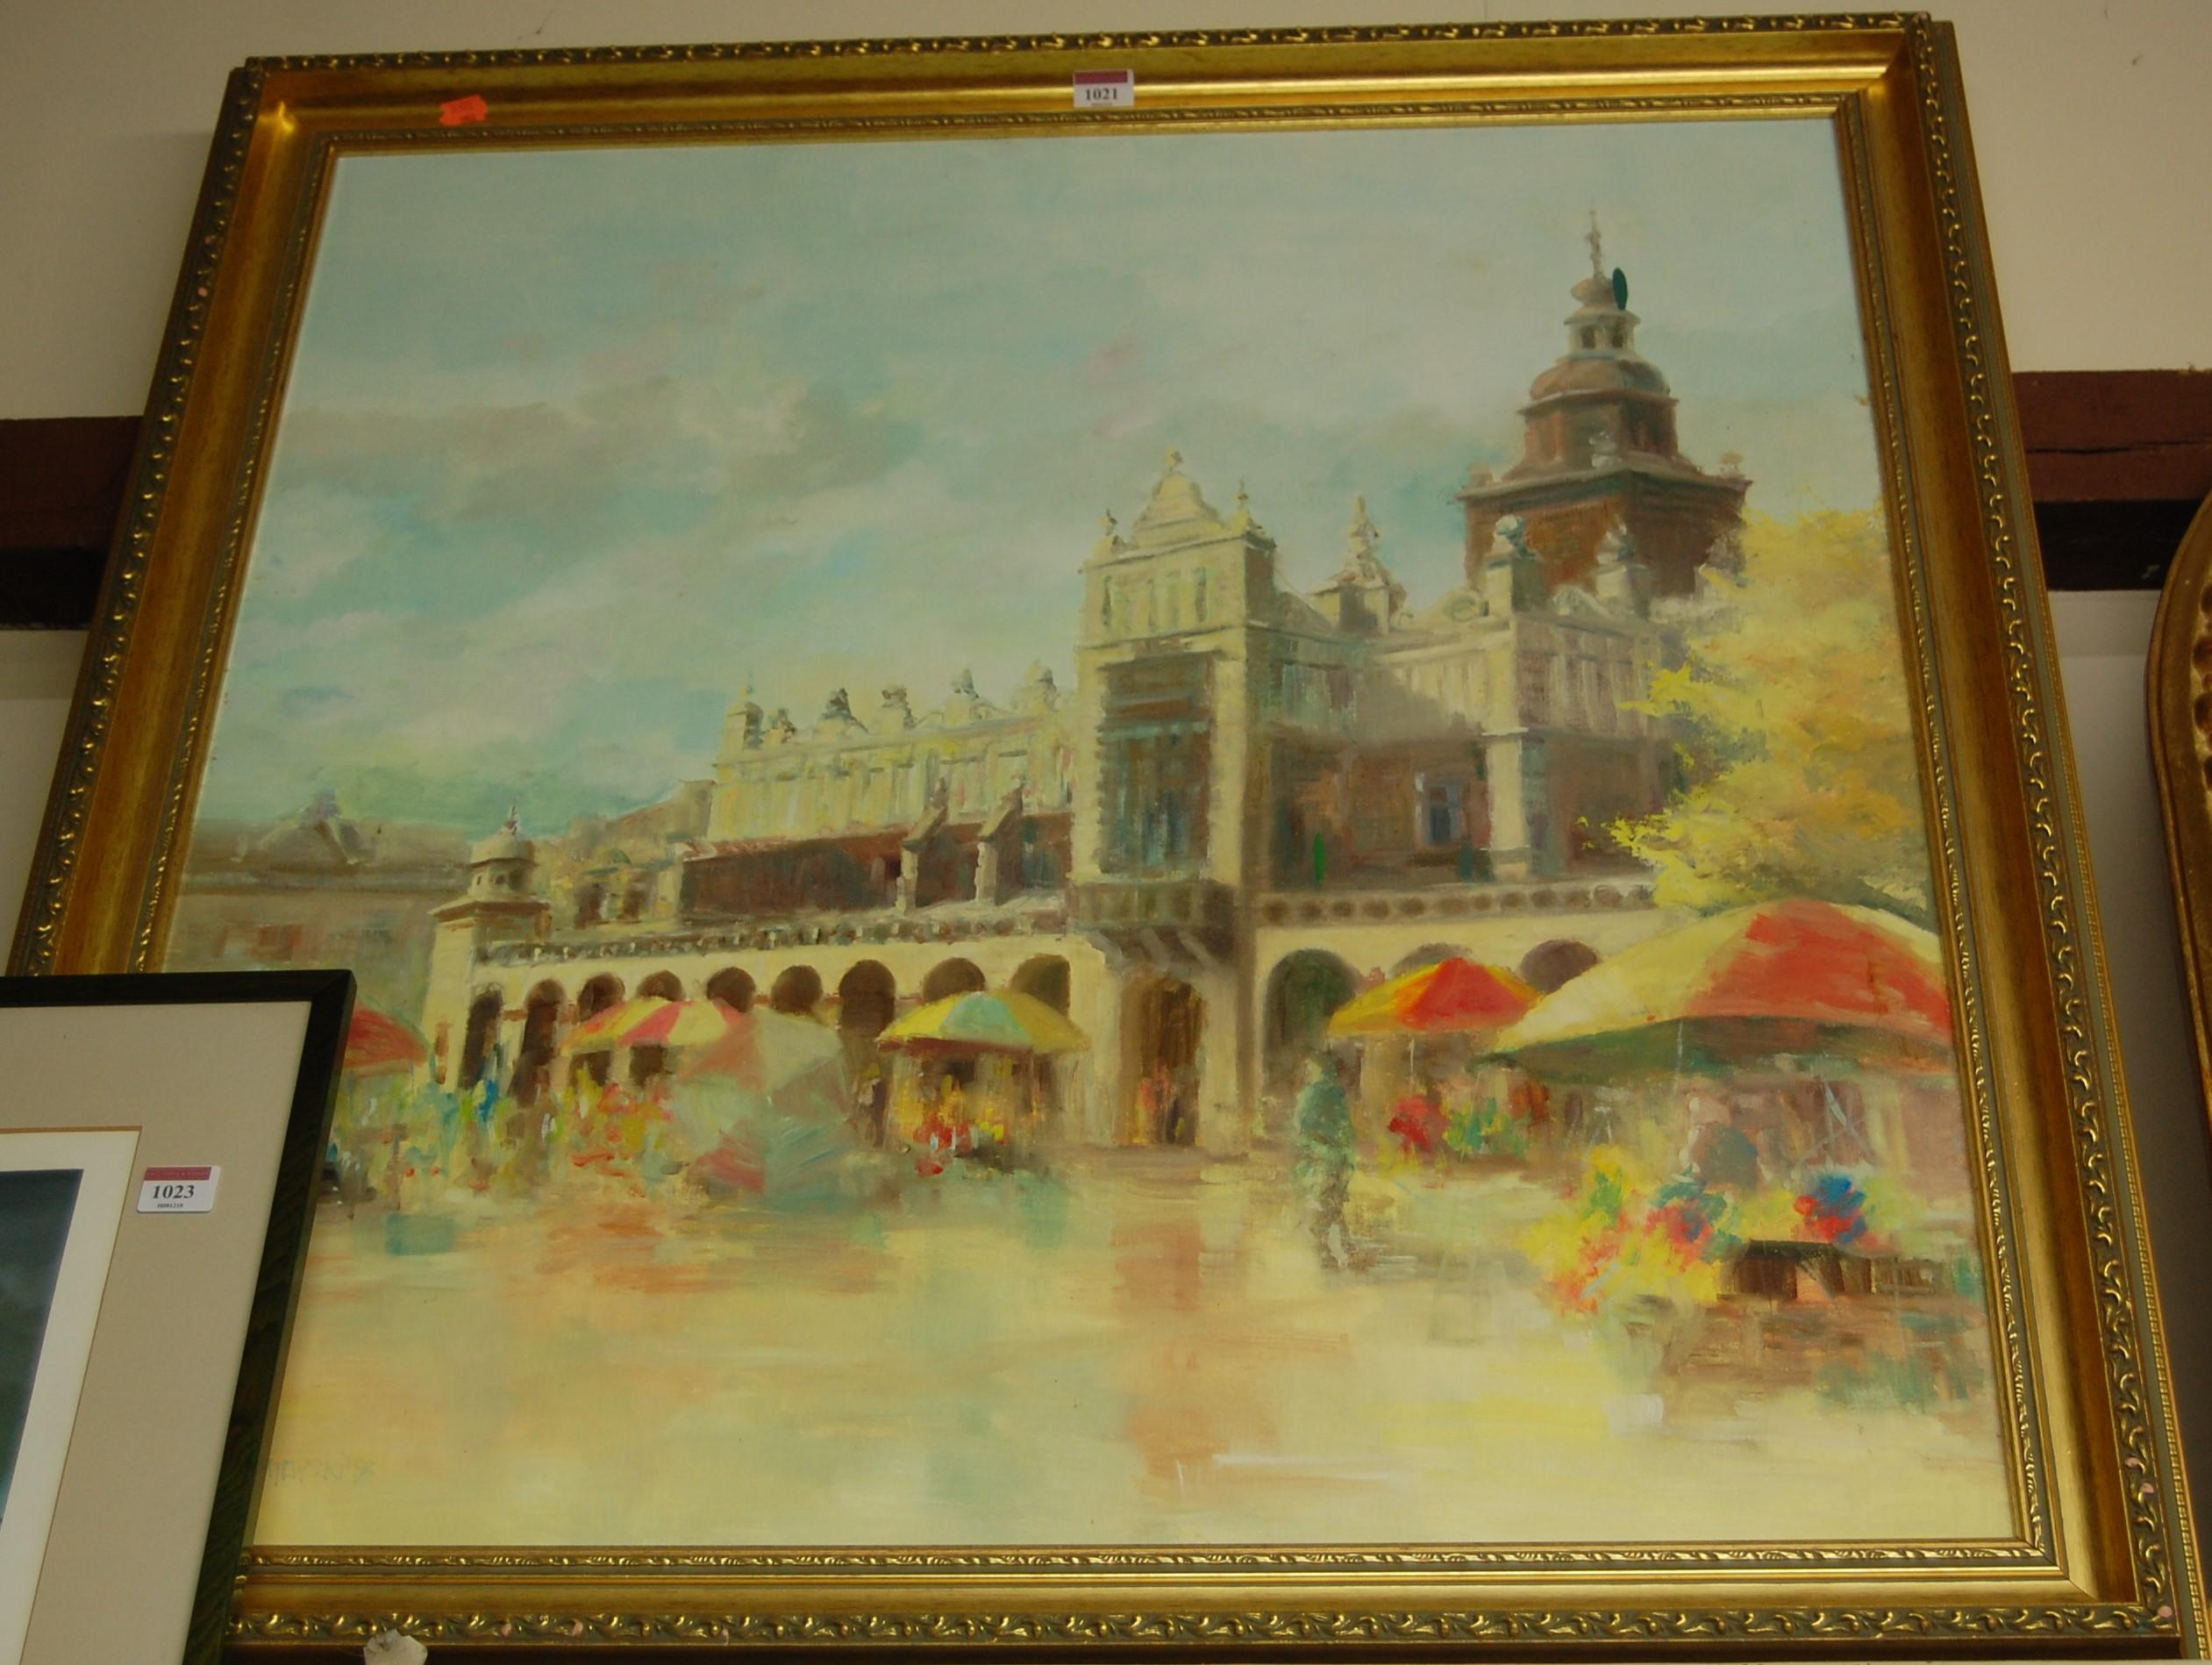 Lot 1021 - T Mikolatewski - piazza scene, oil on canvas, signed lower left, 80x77cm